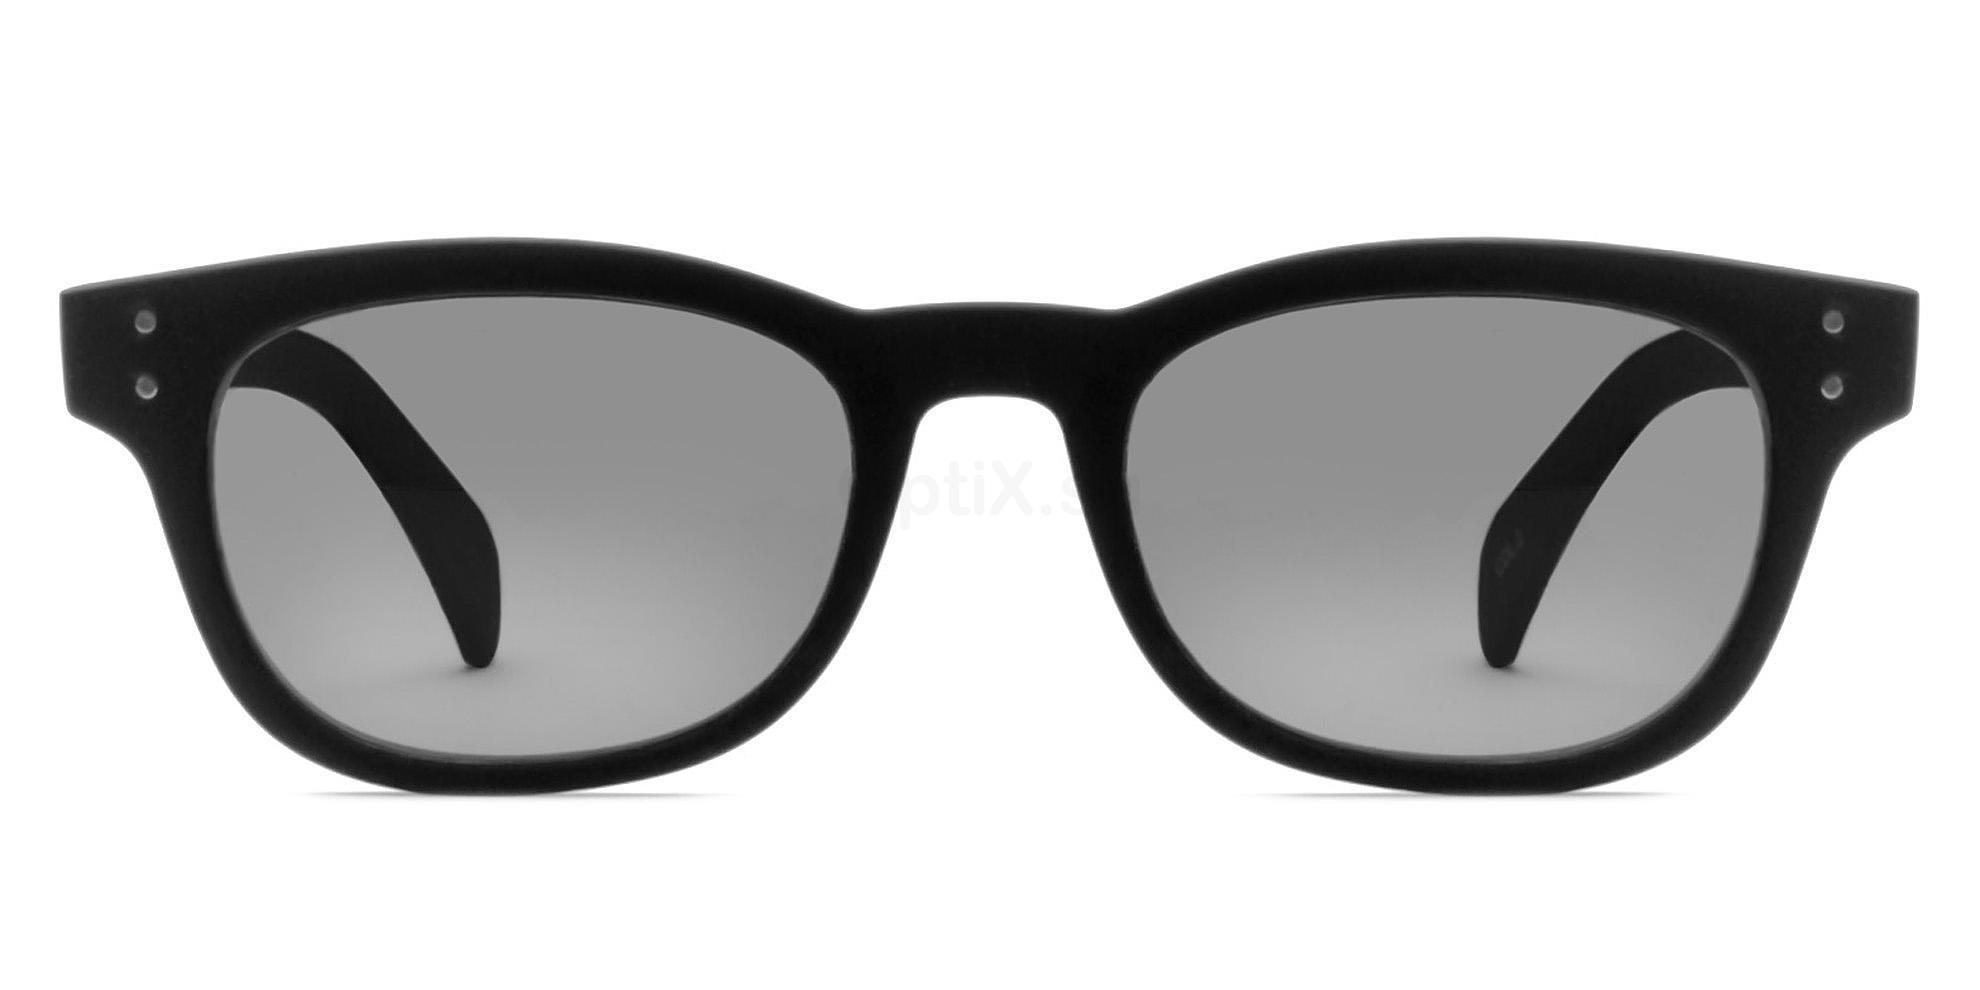 C02 Dark Grey 2249 - Matte Black (Sunglasses) Sunglasses, Savannah